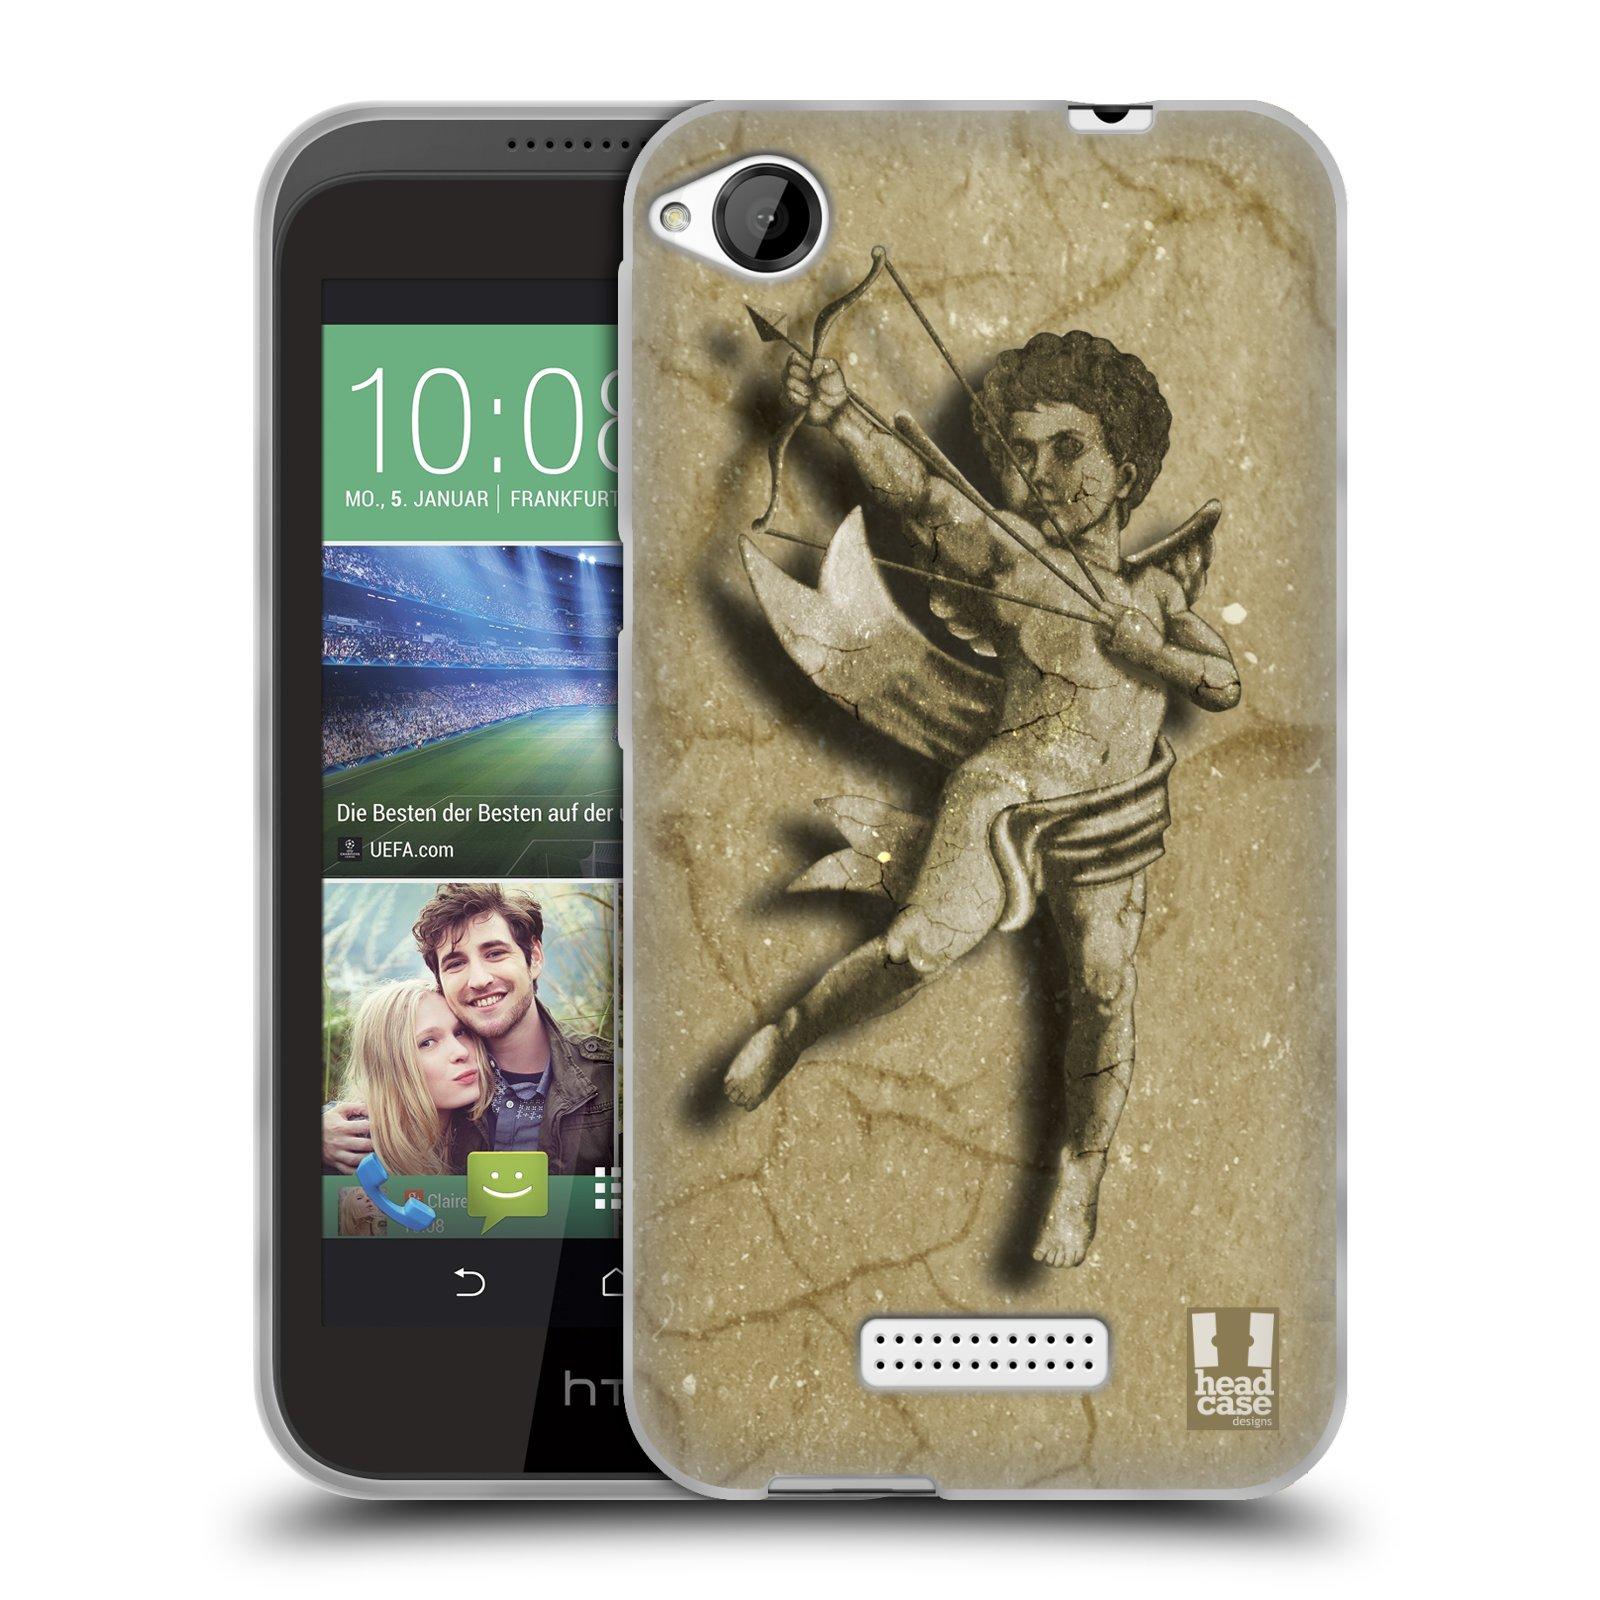 HEAD CASE silikonový obal na mobil HTC DESIRE 320 vzor Andělé z kamene LANCELOT